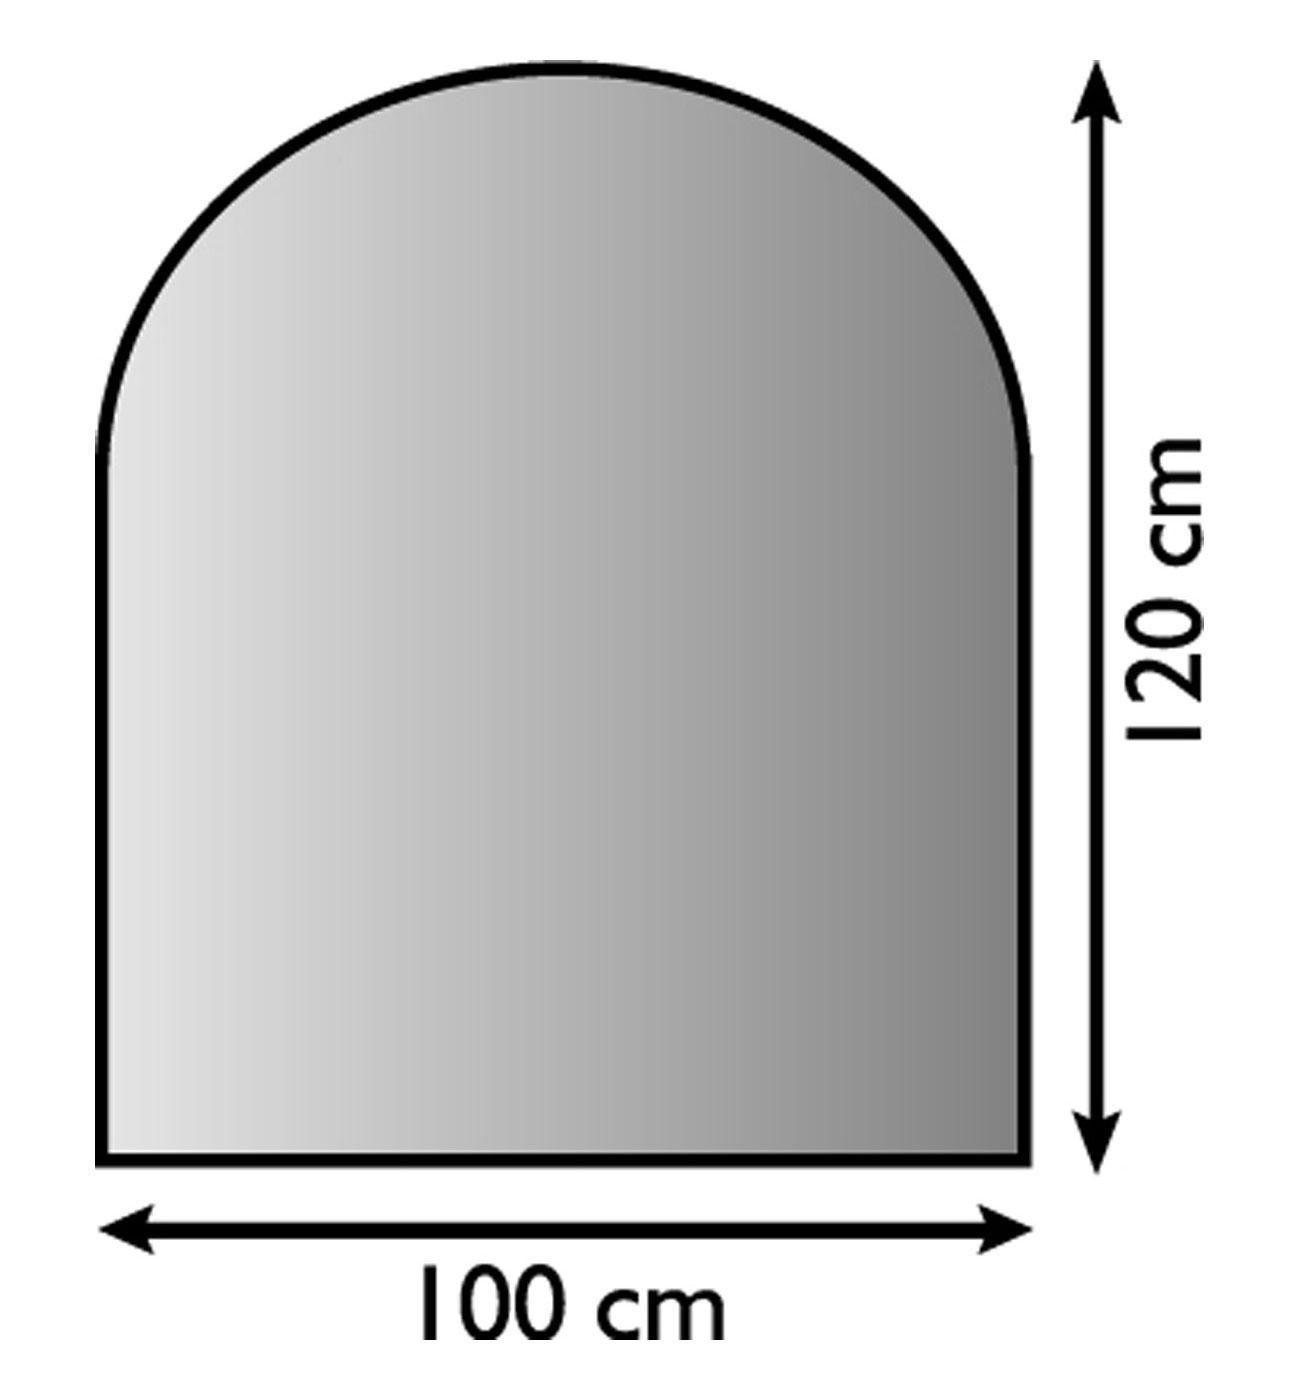 Funkenschutzplatte / Bodenblech Lienbacher schwarz halbrund 100x120cm Bild 1